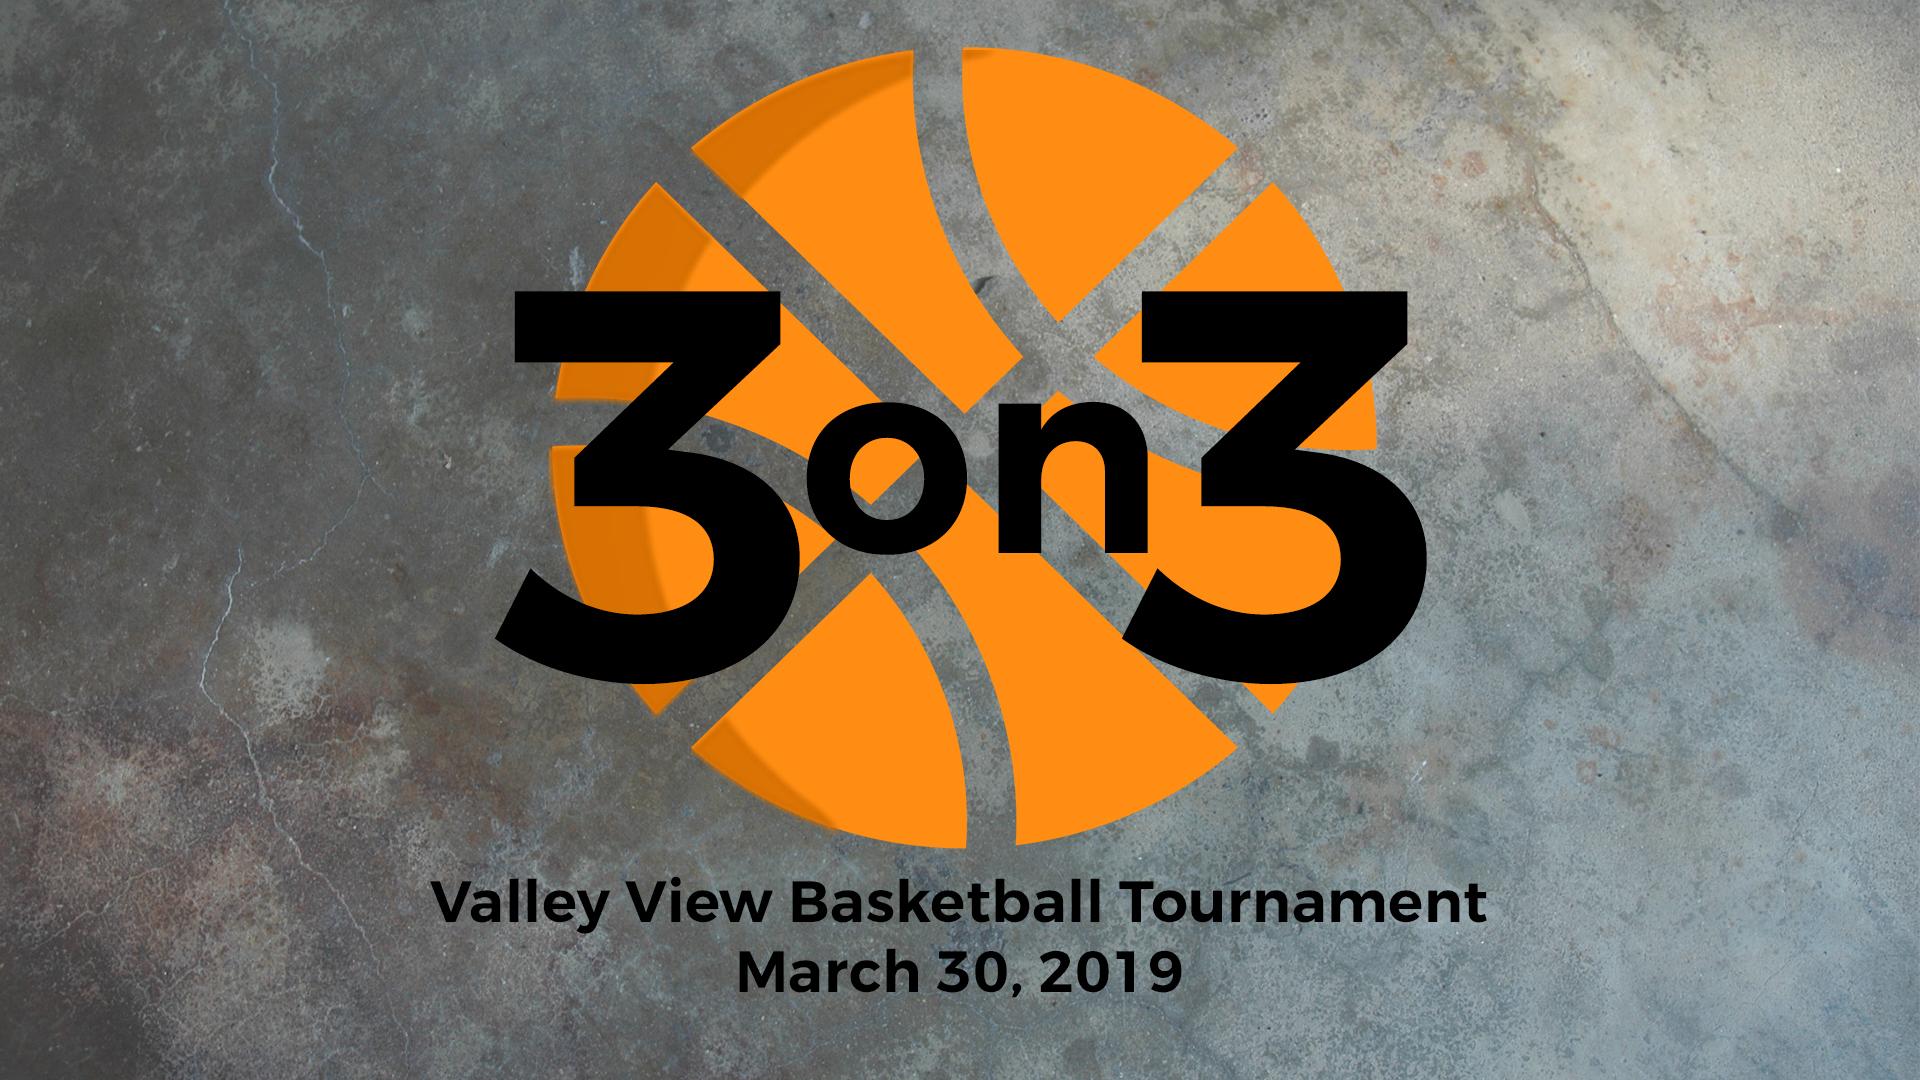 3-on-3 basketball tournament dallas